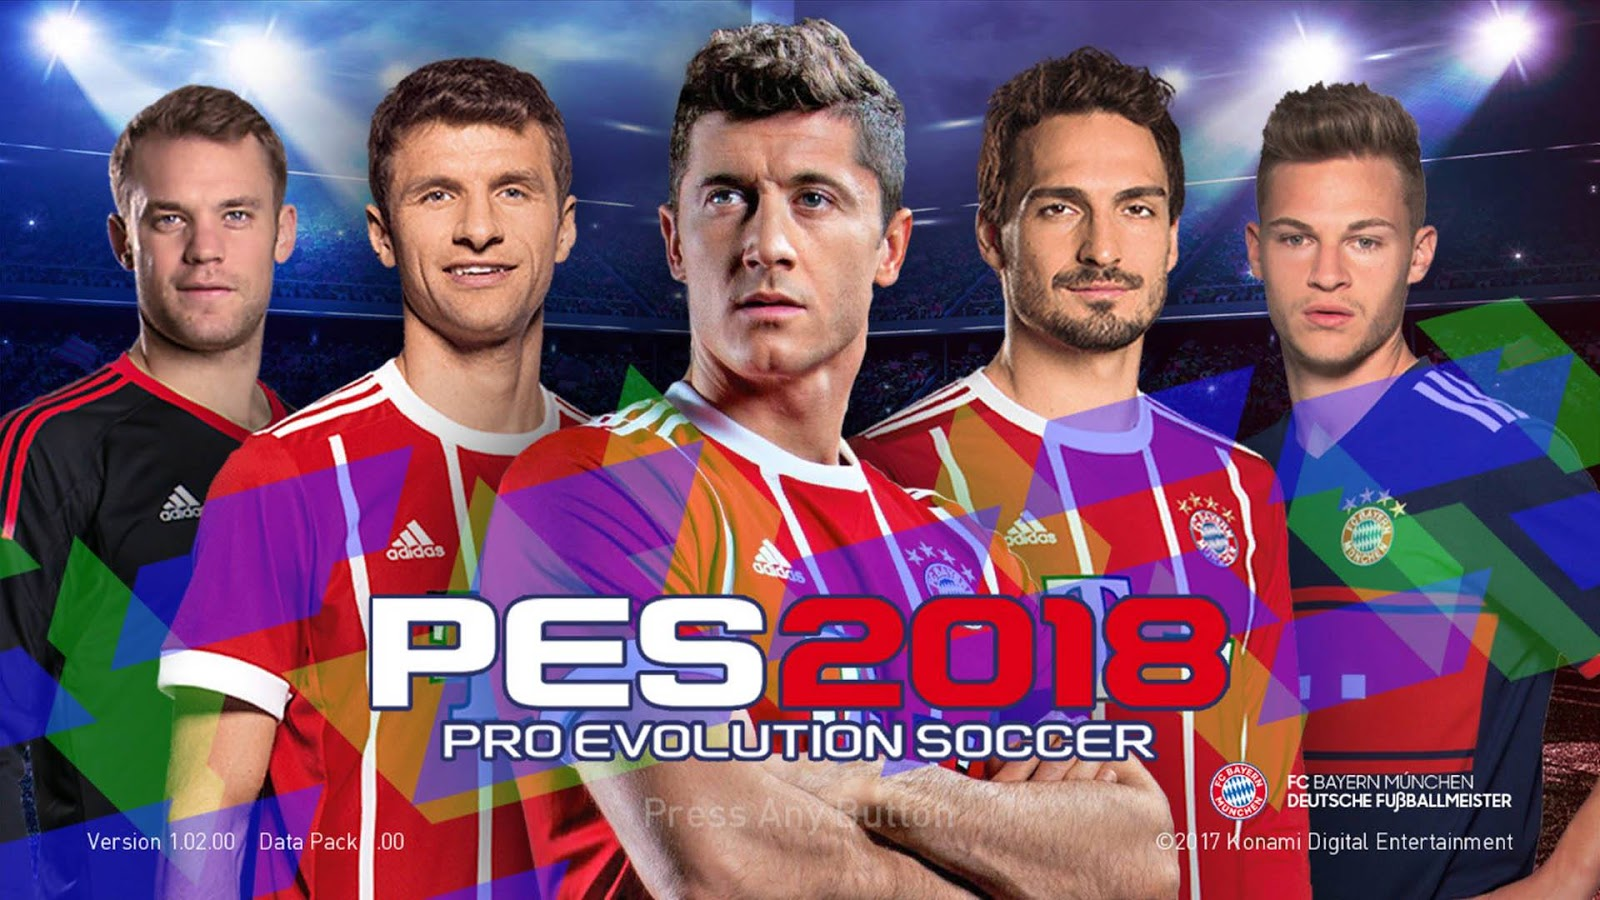 PES 2018 FC Bayern Munchen 17/18 Startscreen by Ega Oi